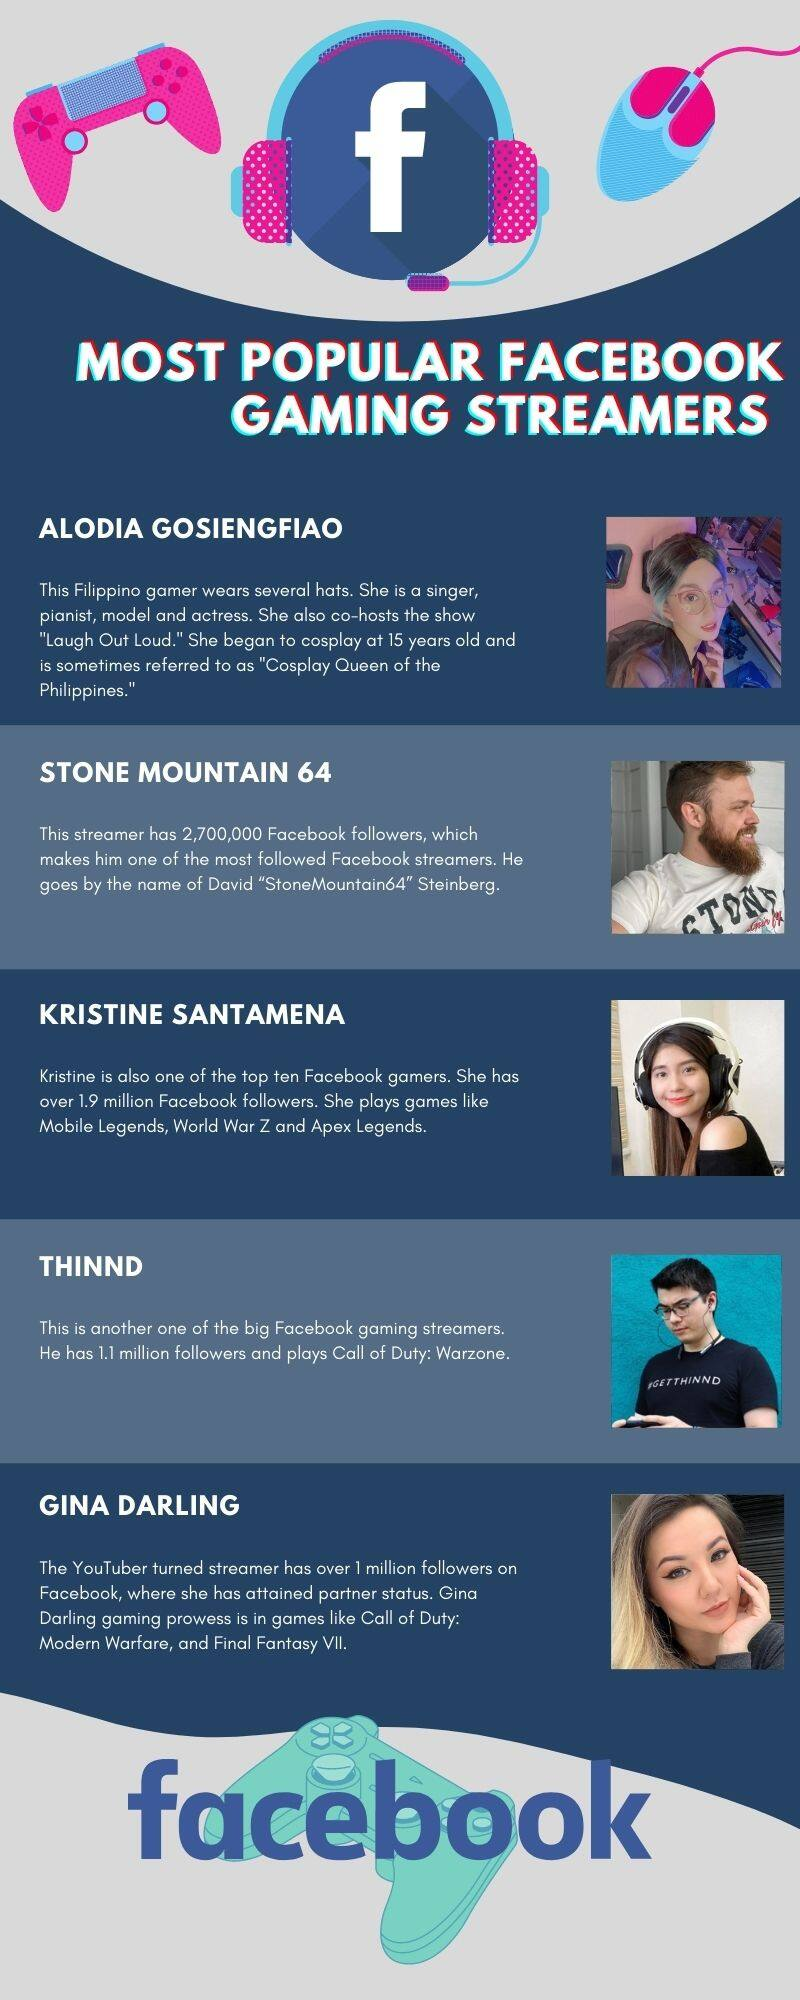 most popular Facebook gaming streamers